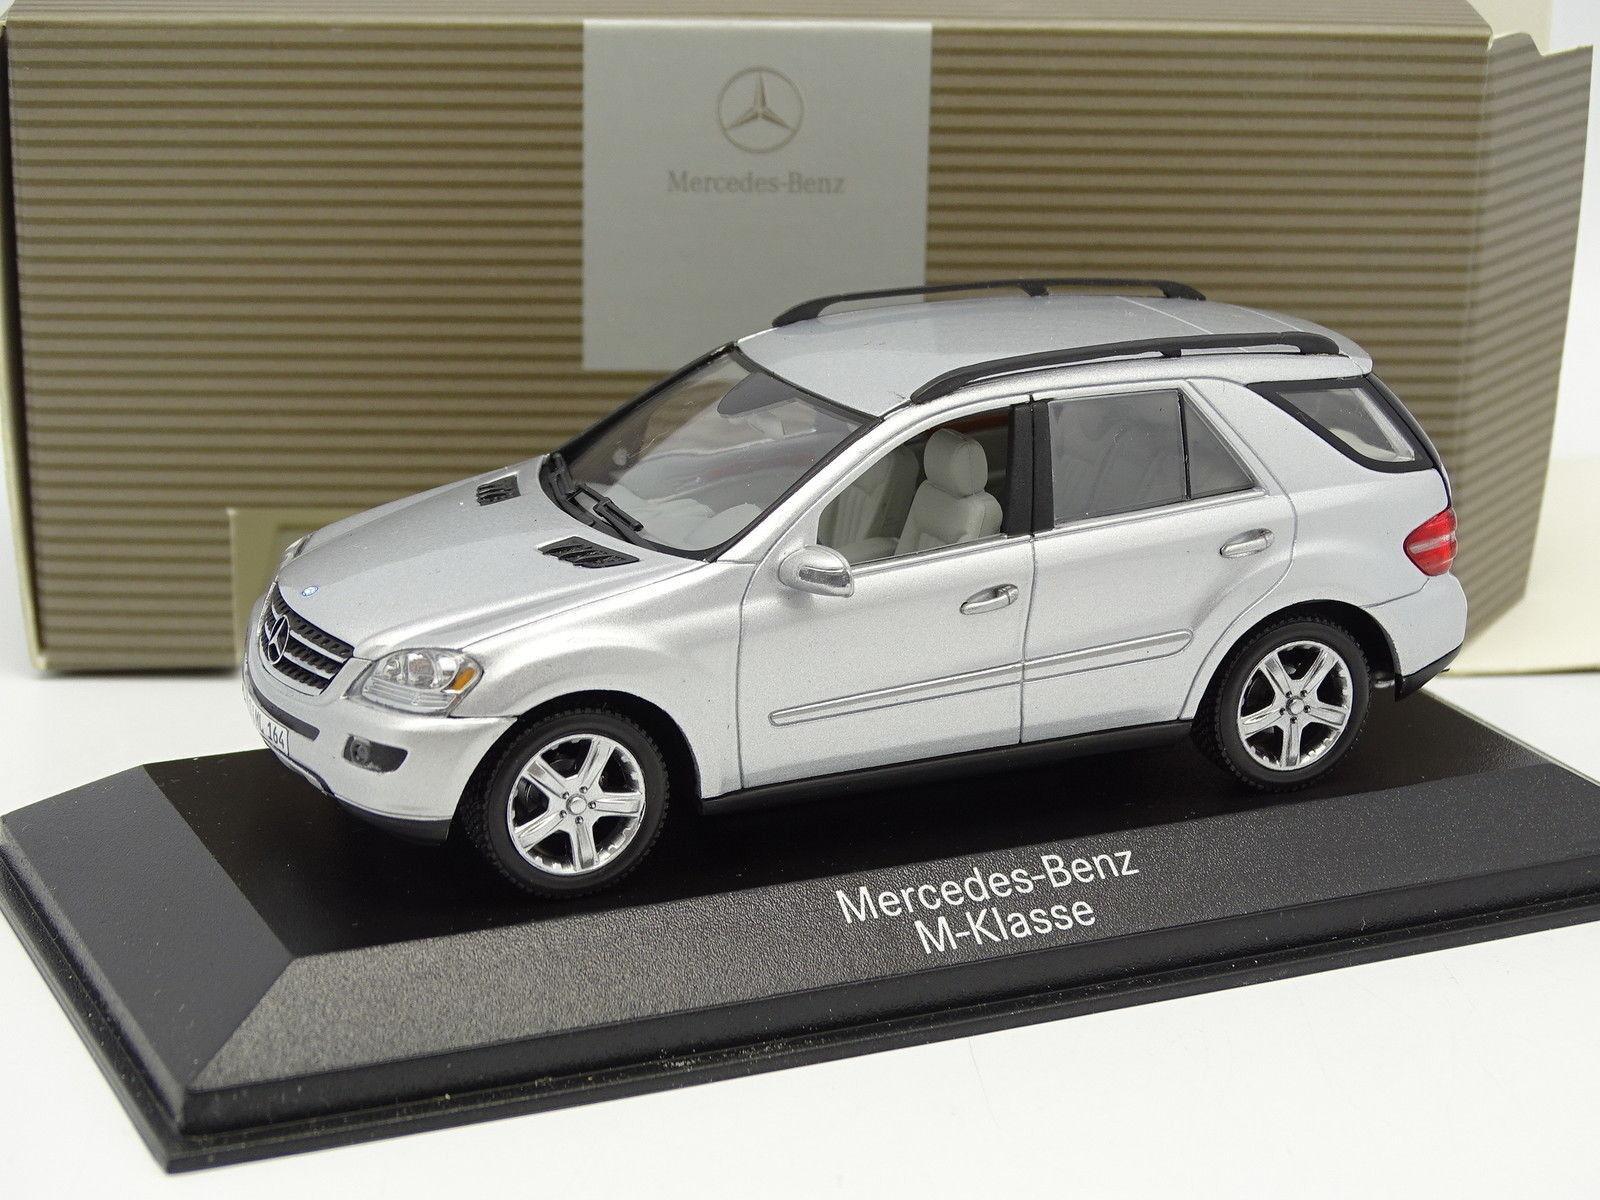 Minichamps 1 43 - Mercedes Class M Silver